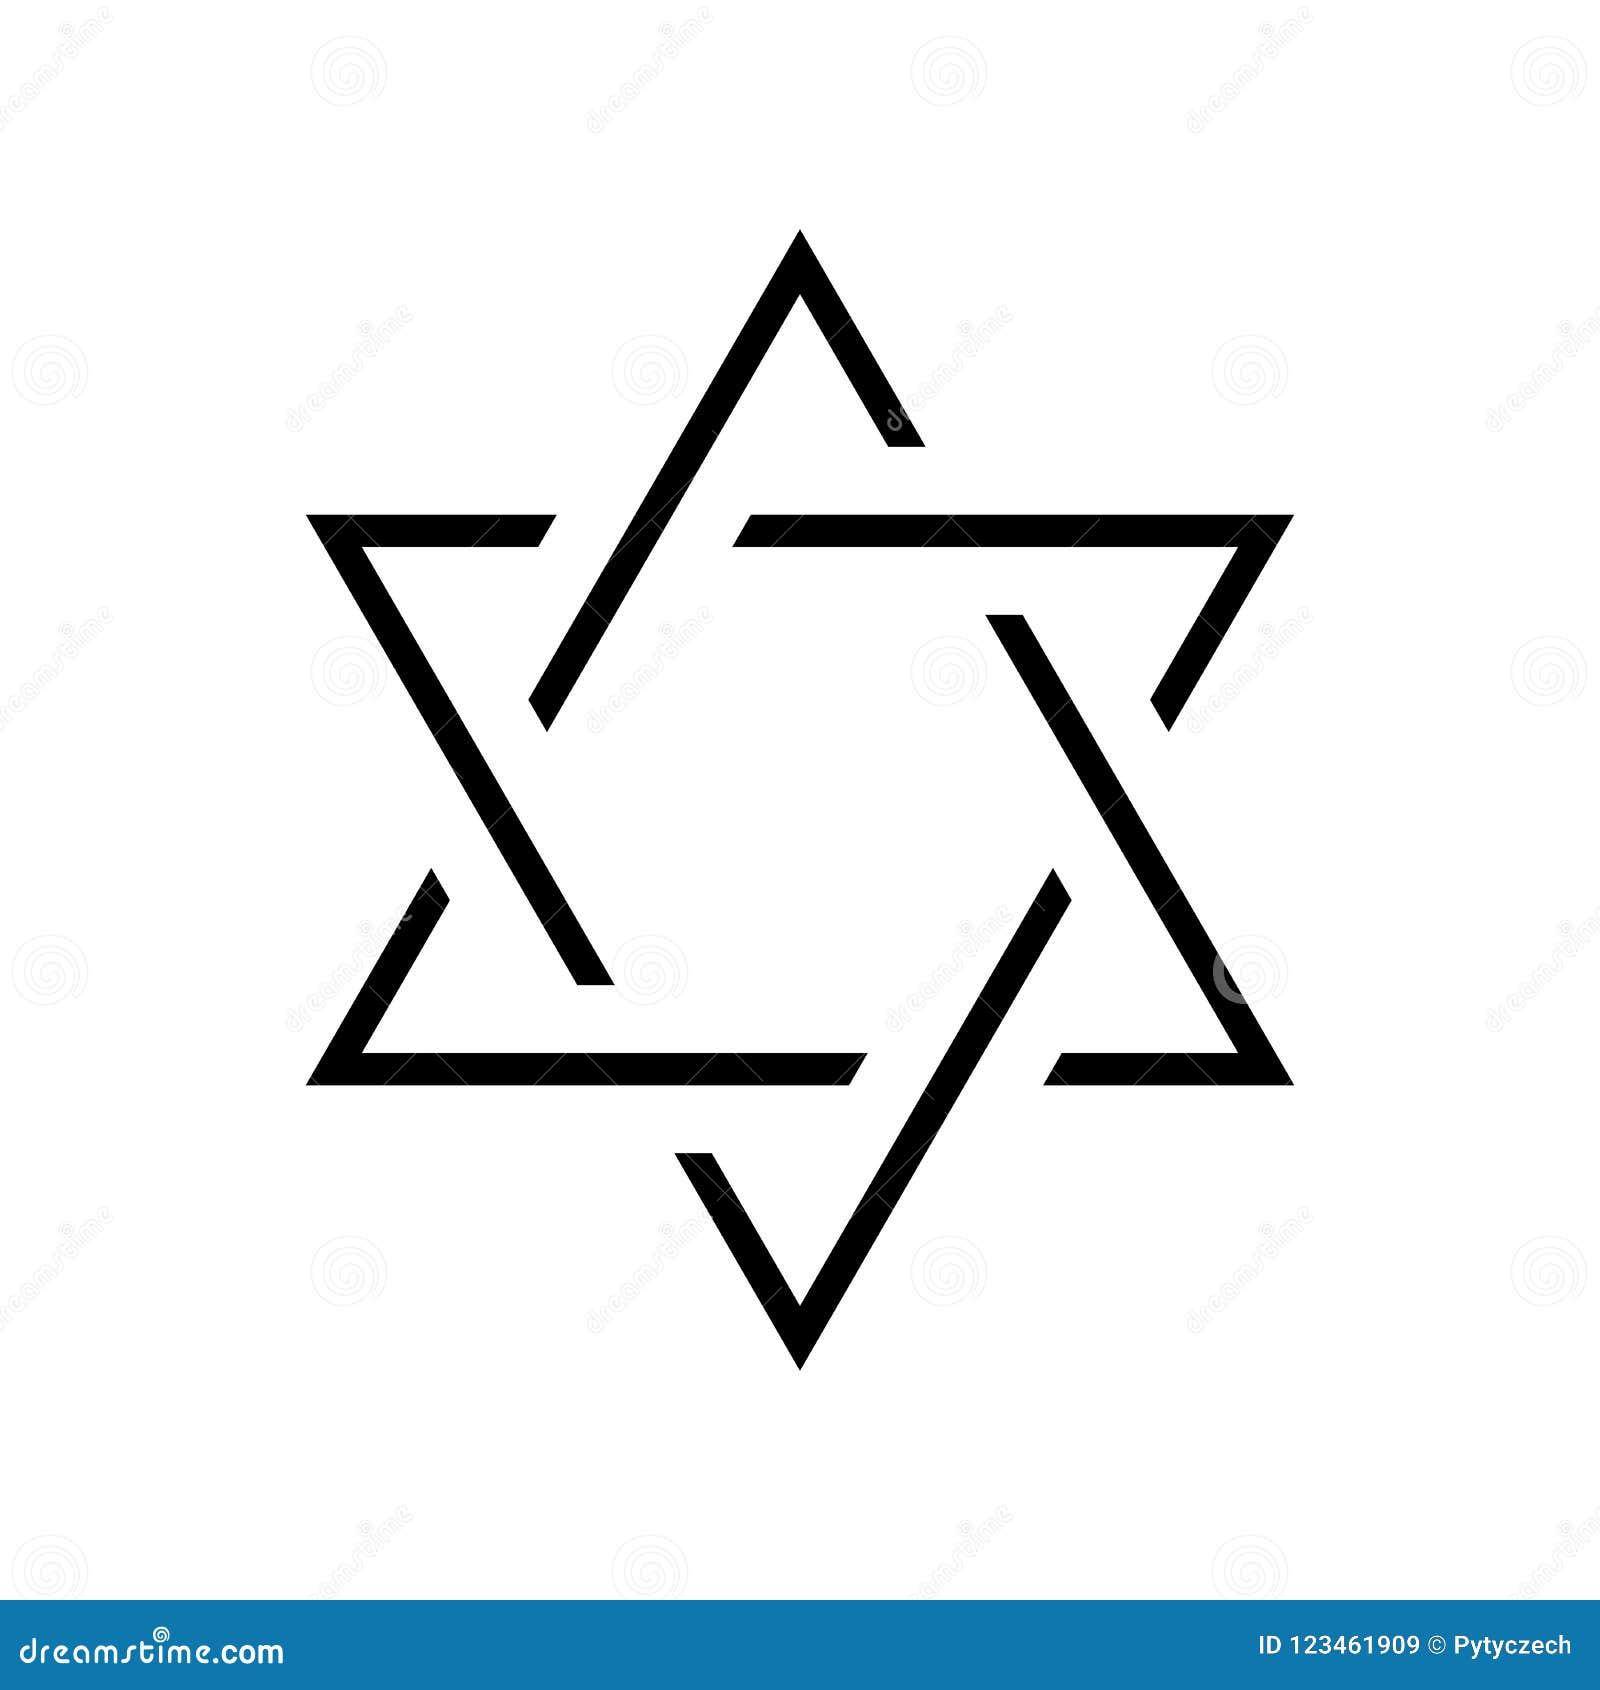 Star Of David Hexagram Sign Symbol Of Jewish Identity And Judaism